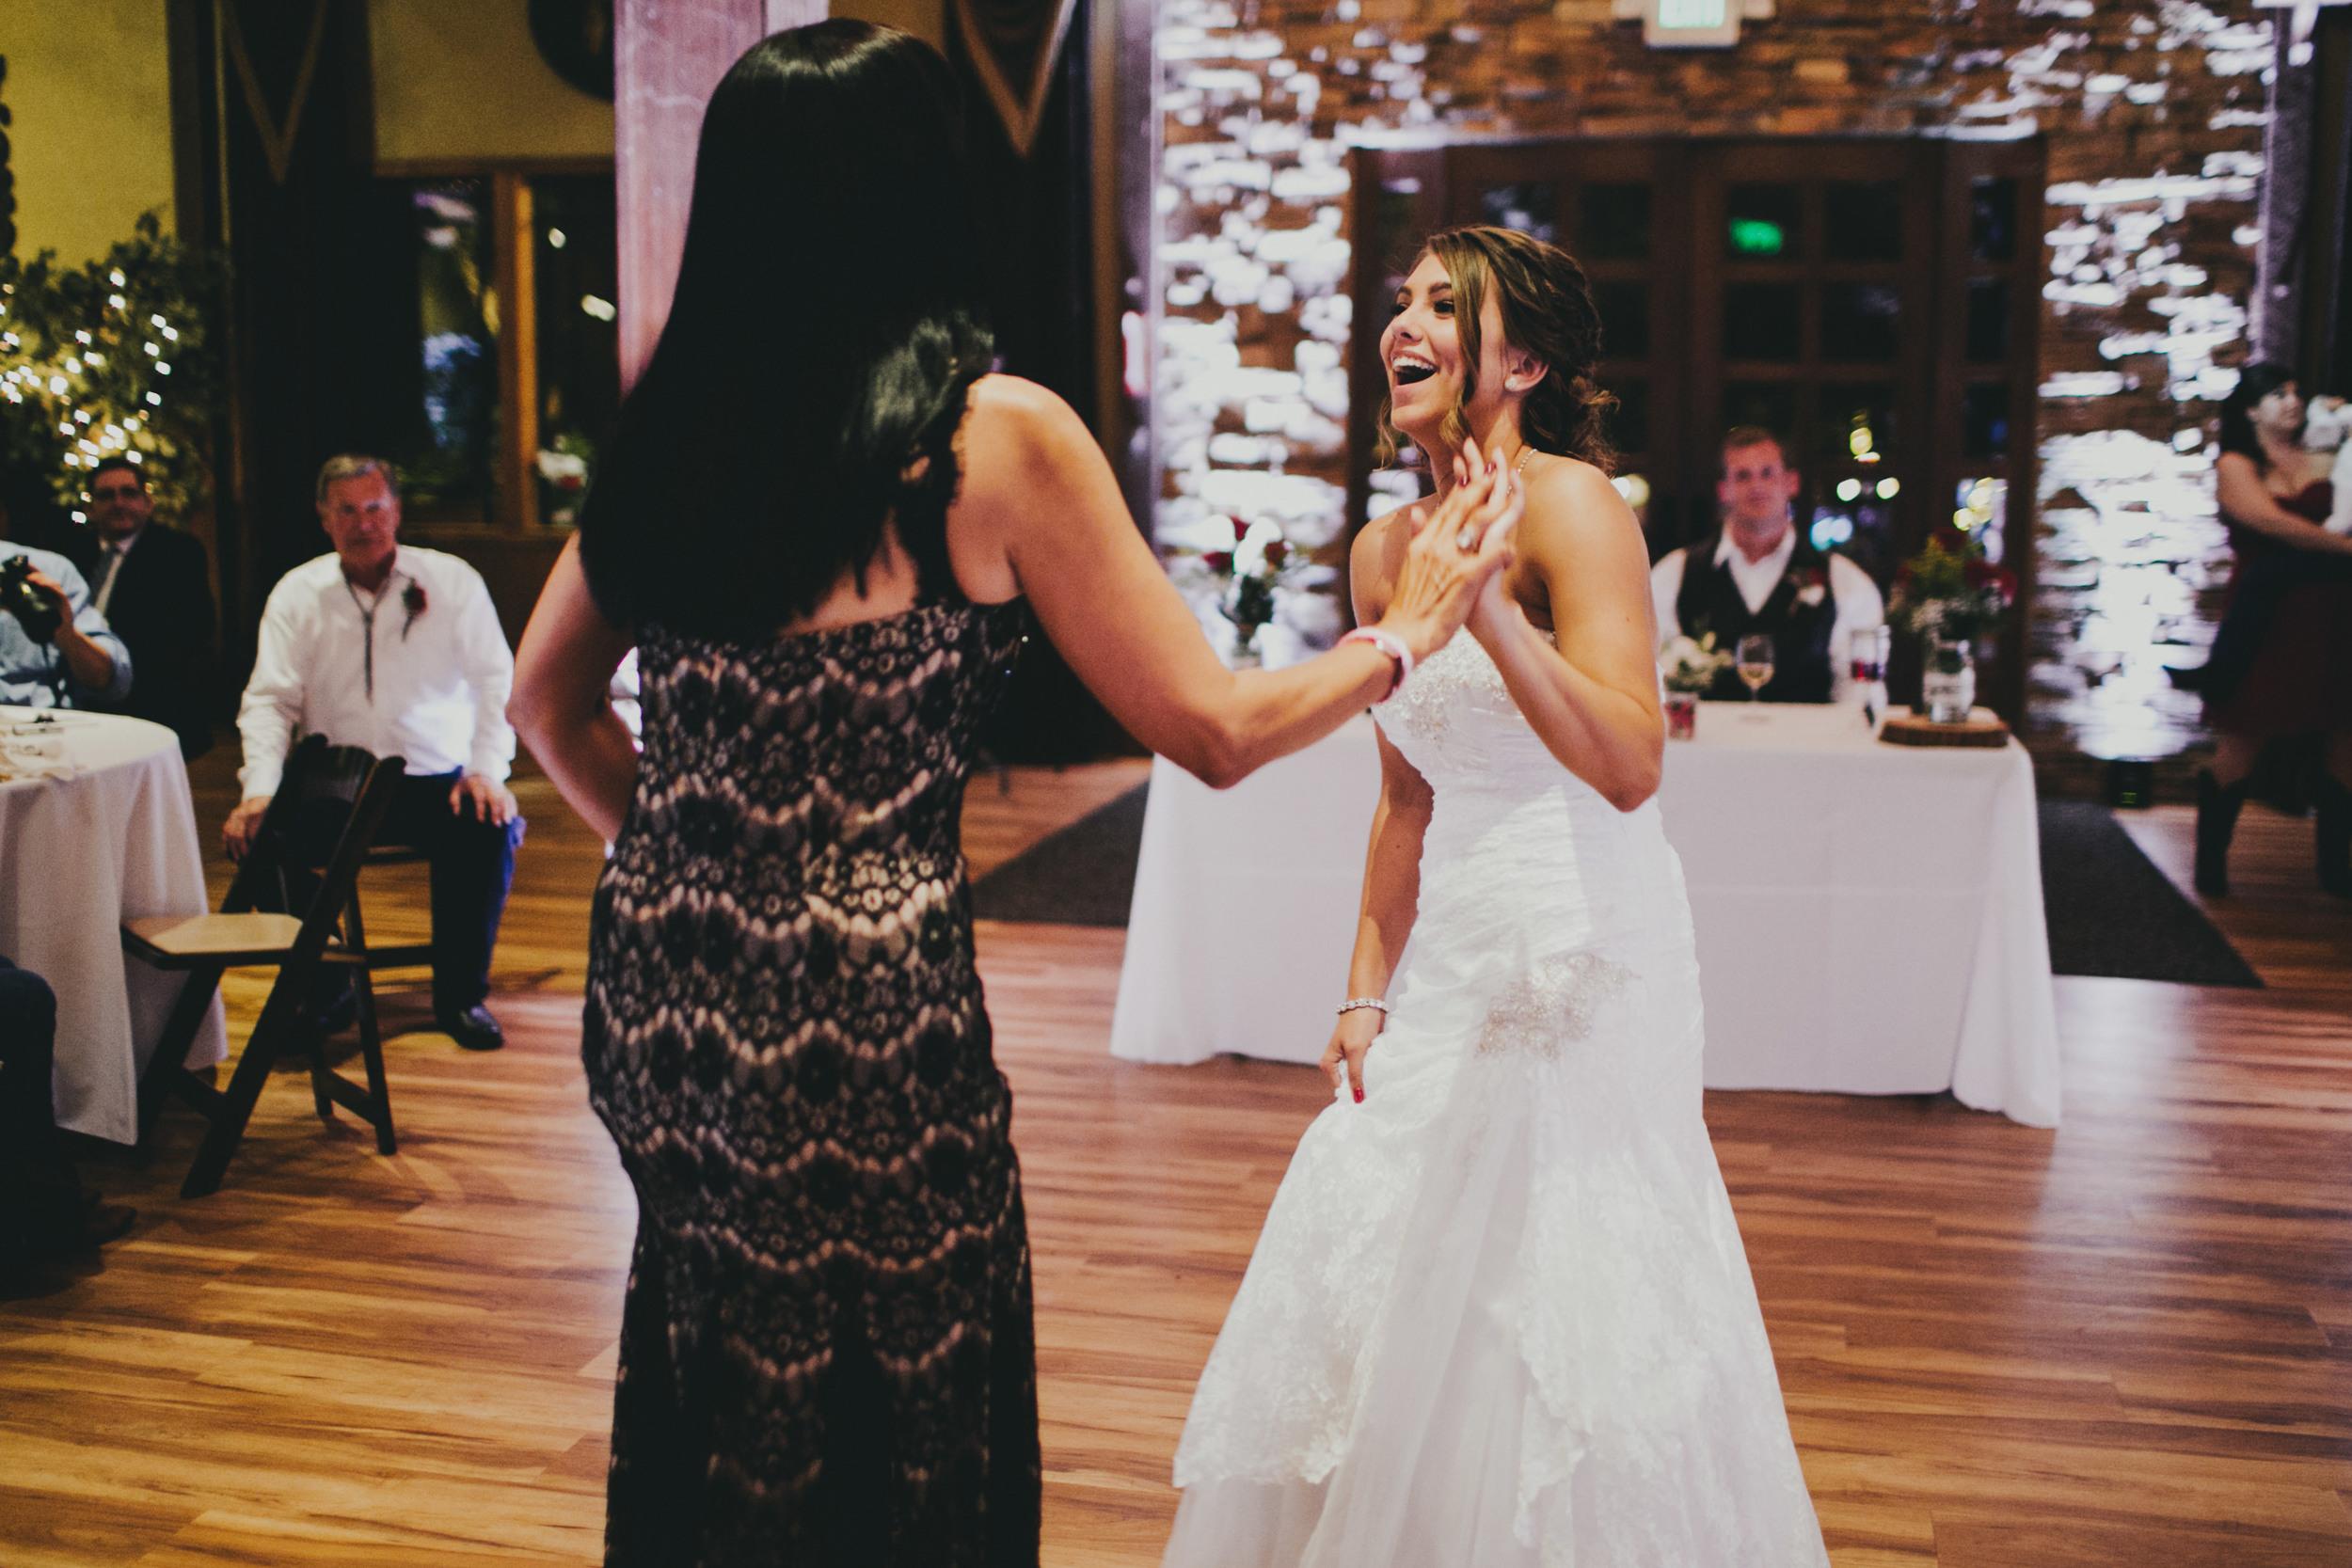 Cheyenne + Jordan - Wedding, Natalie Griffo (119 of 157).jpg